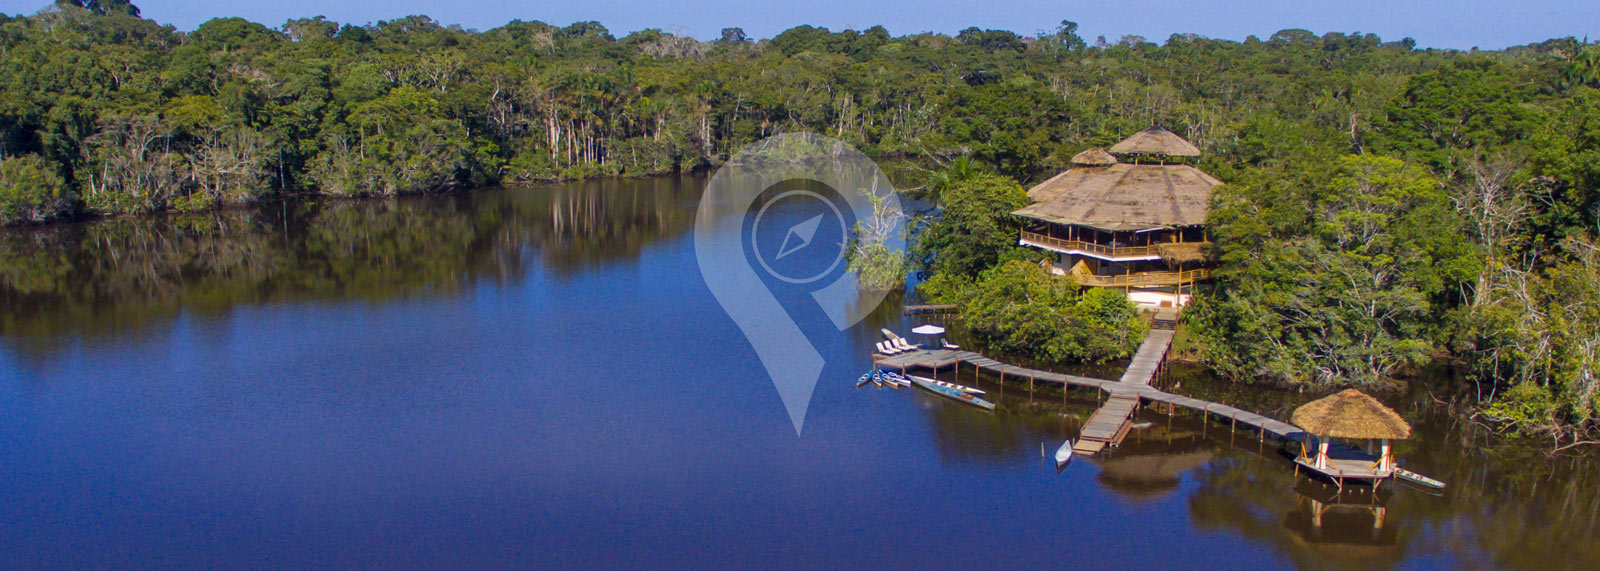 La Selva Eco Lodge